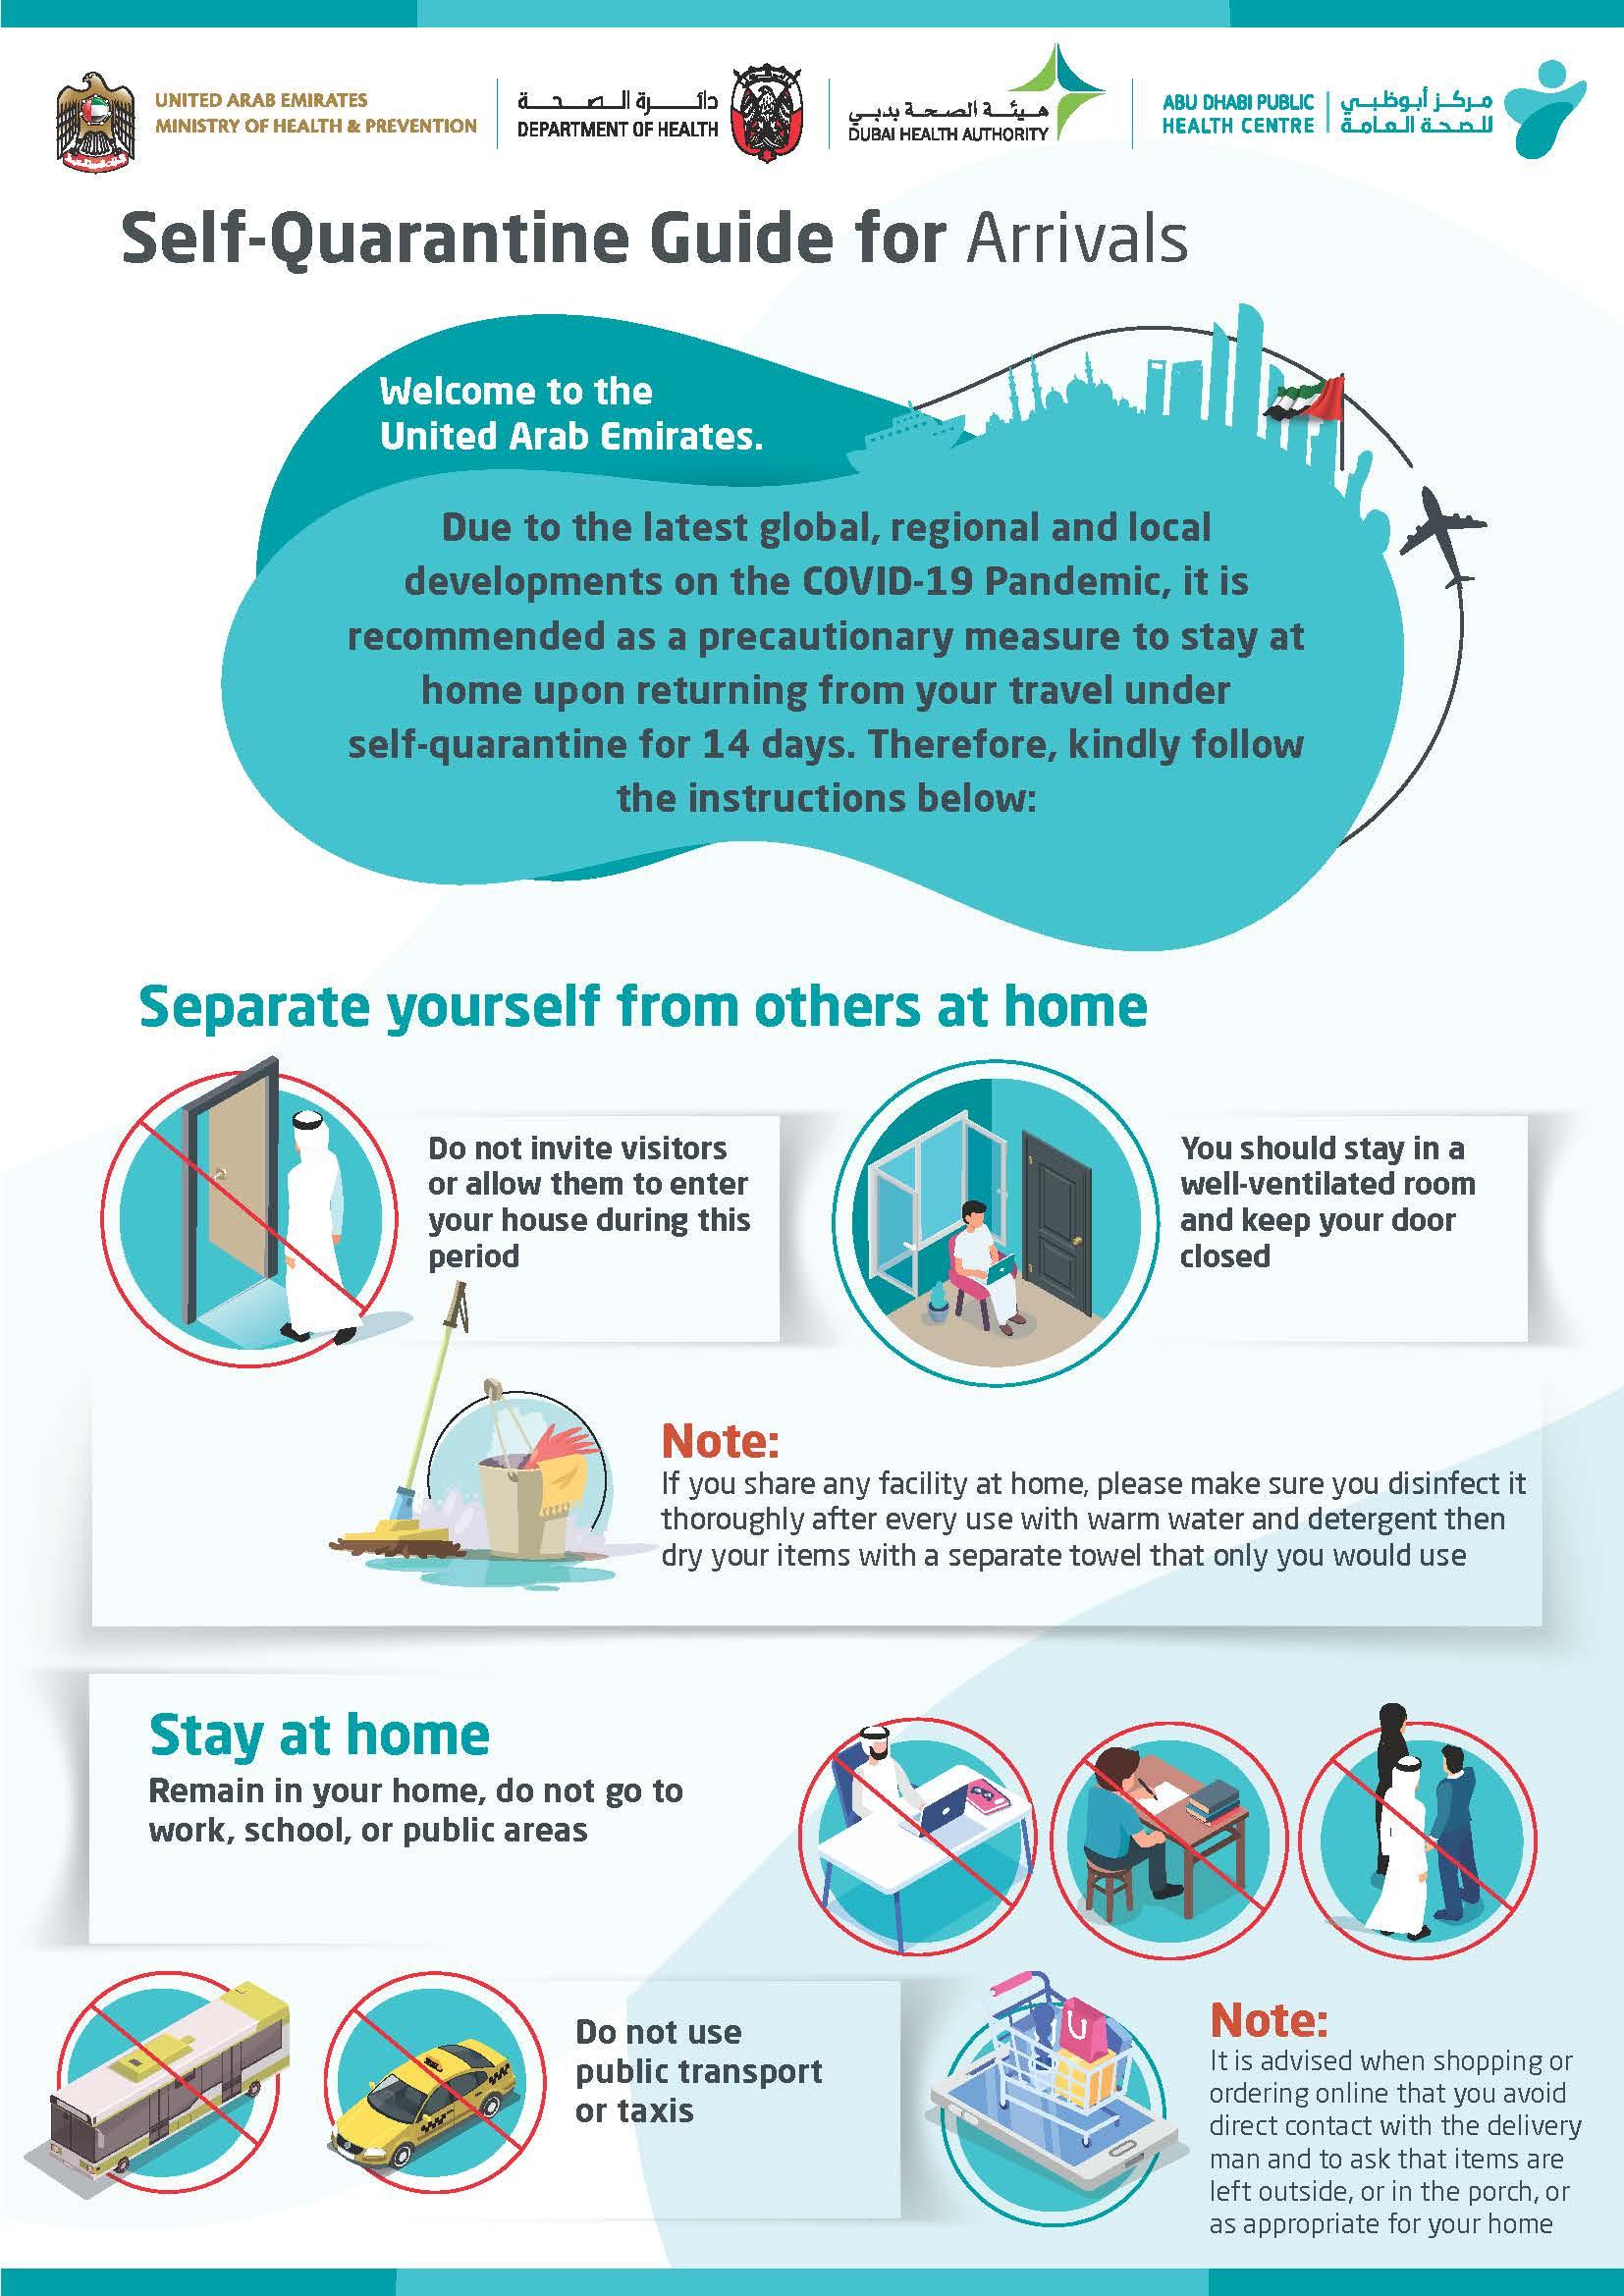 Self-Quarantine Guide